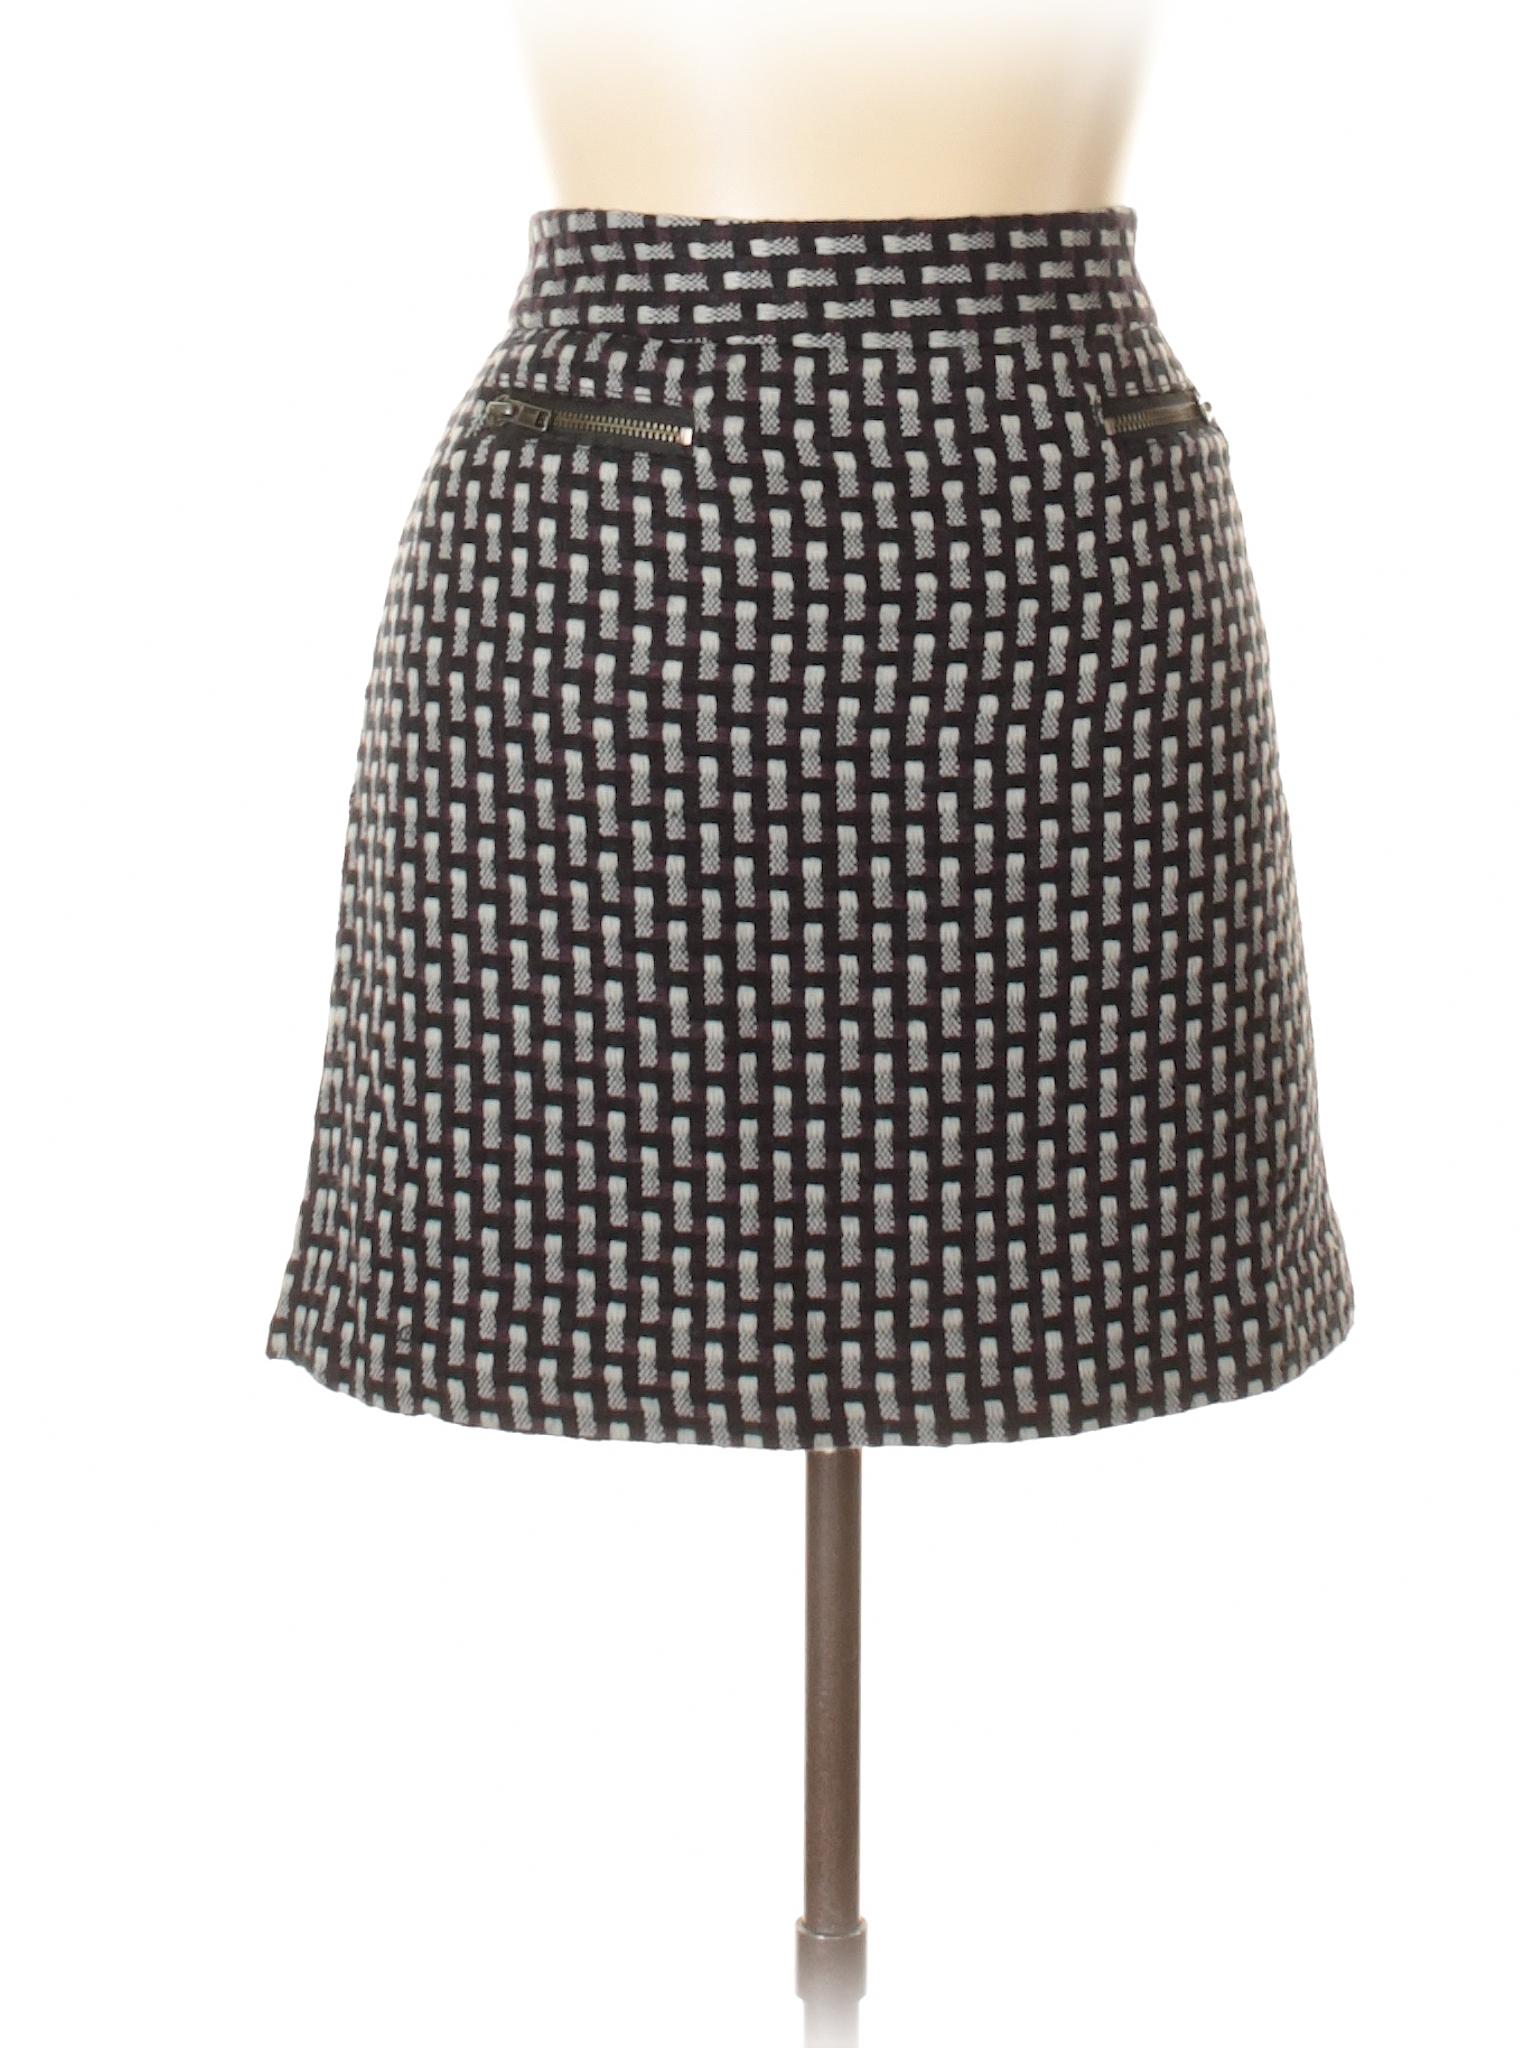 Skirt Casual Taylor Leisure Ann winter LOFT qUw00ZXR